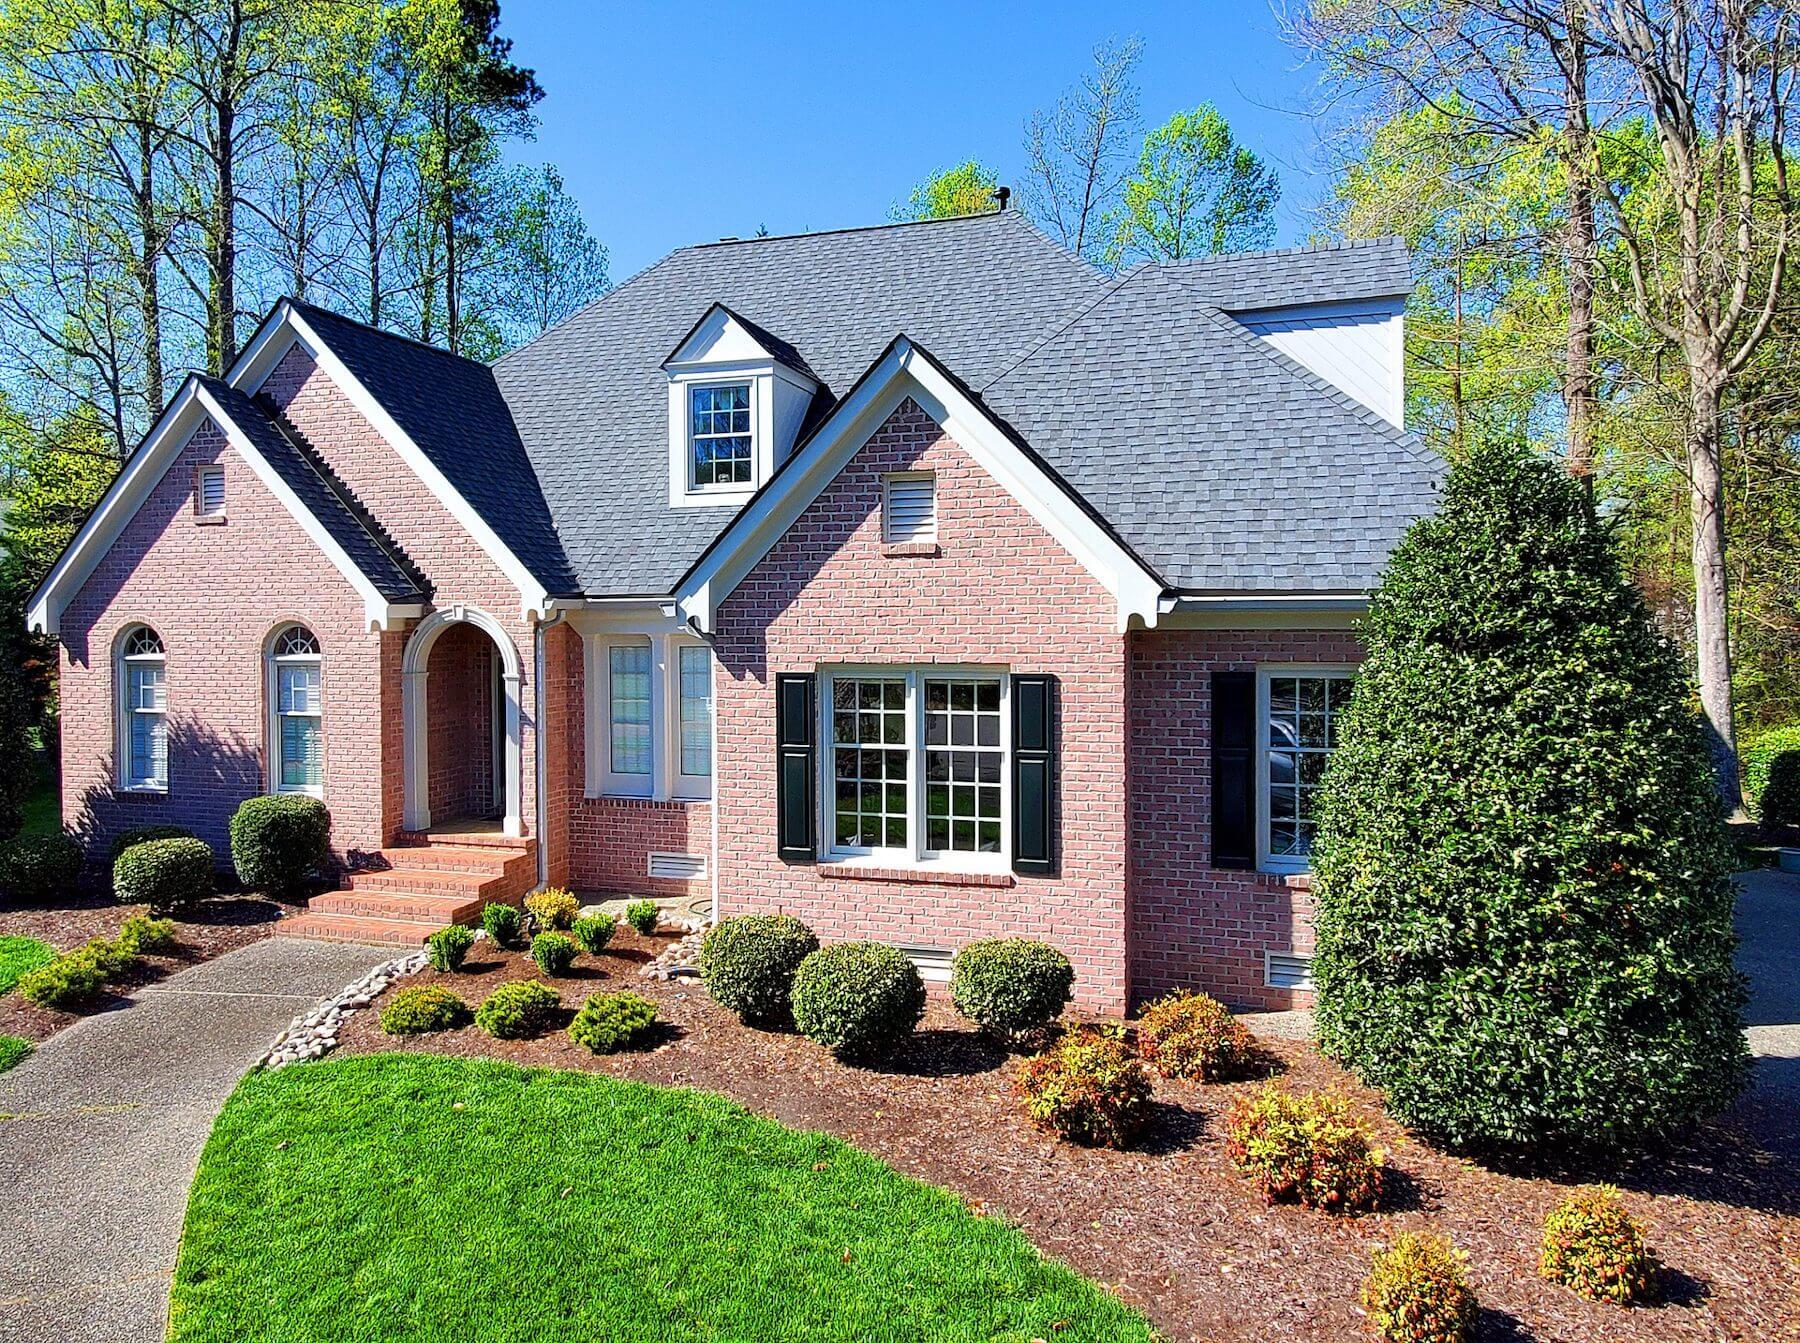 brick home with gray shingles